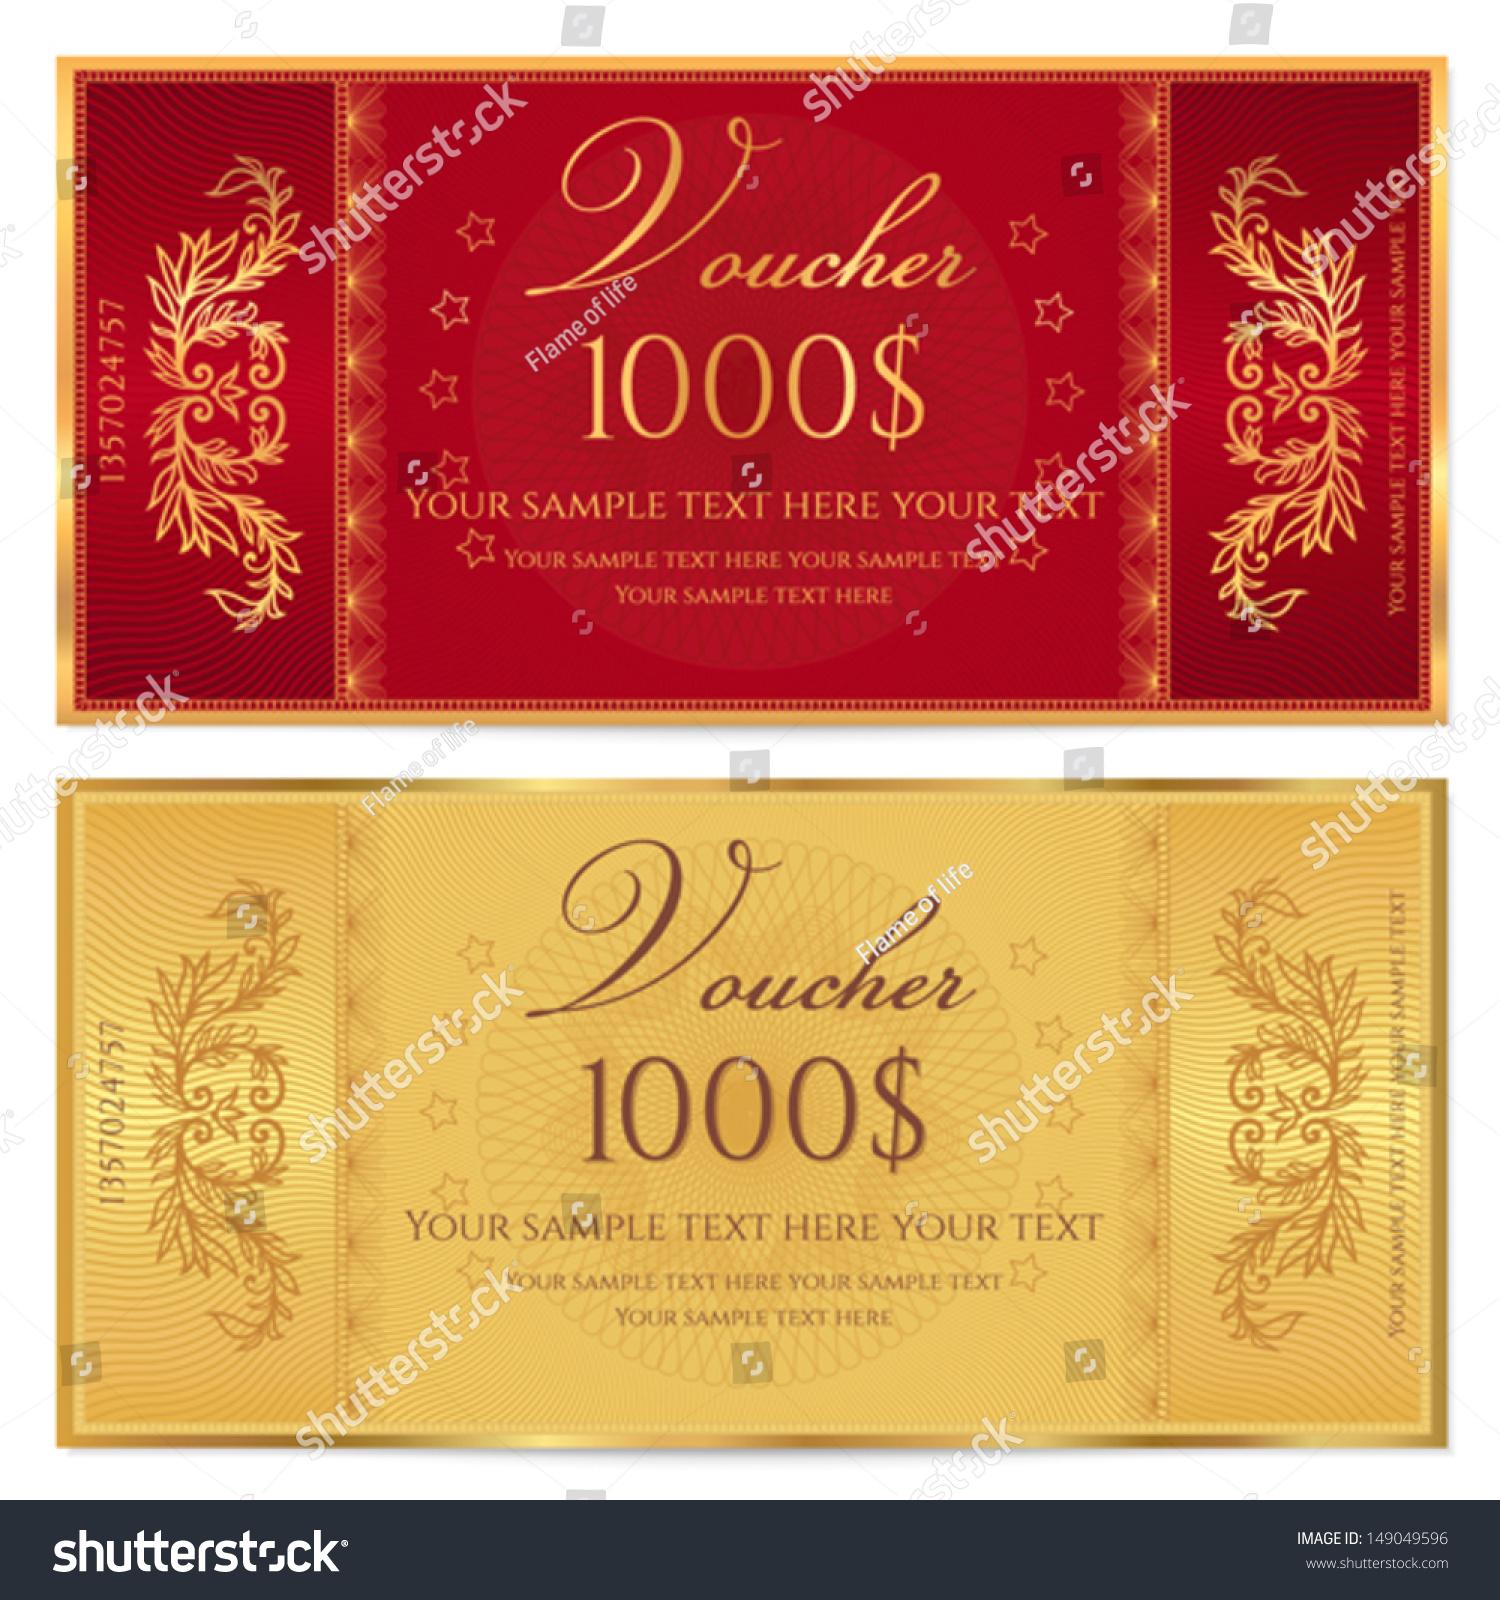 Black And Gold Gift Certificate Design Template voucher design – Ticket Design Template Free